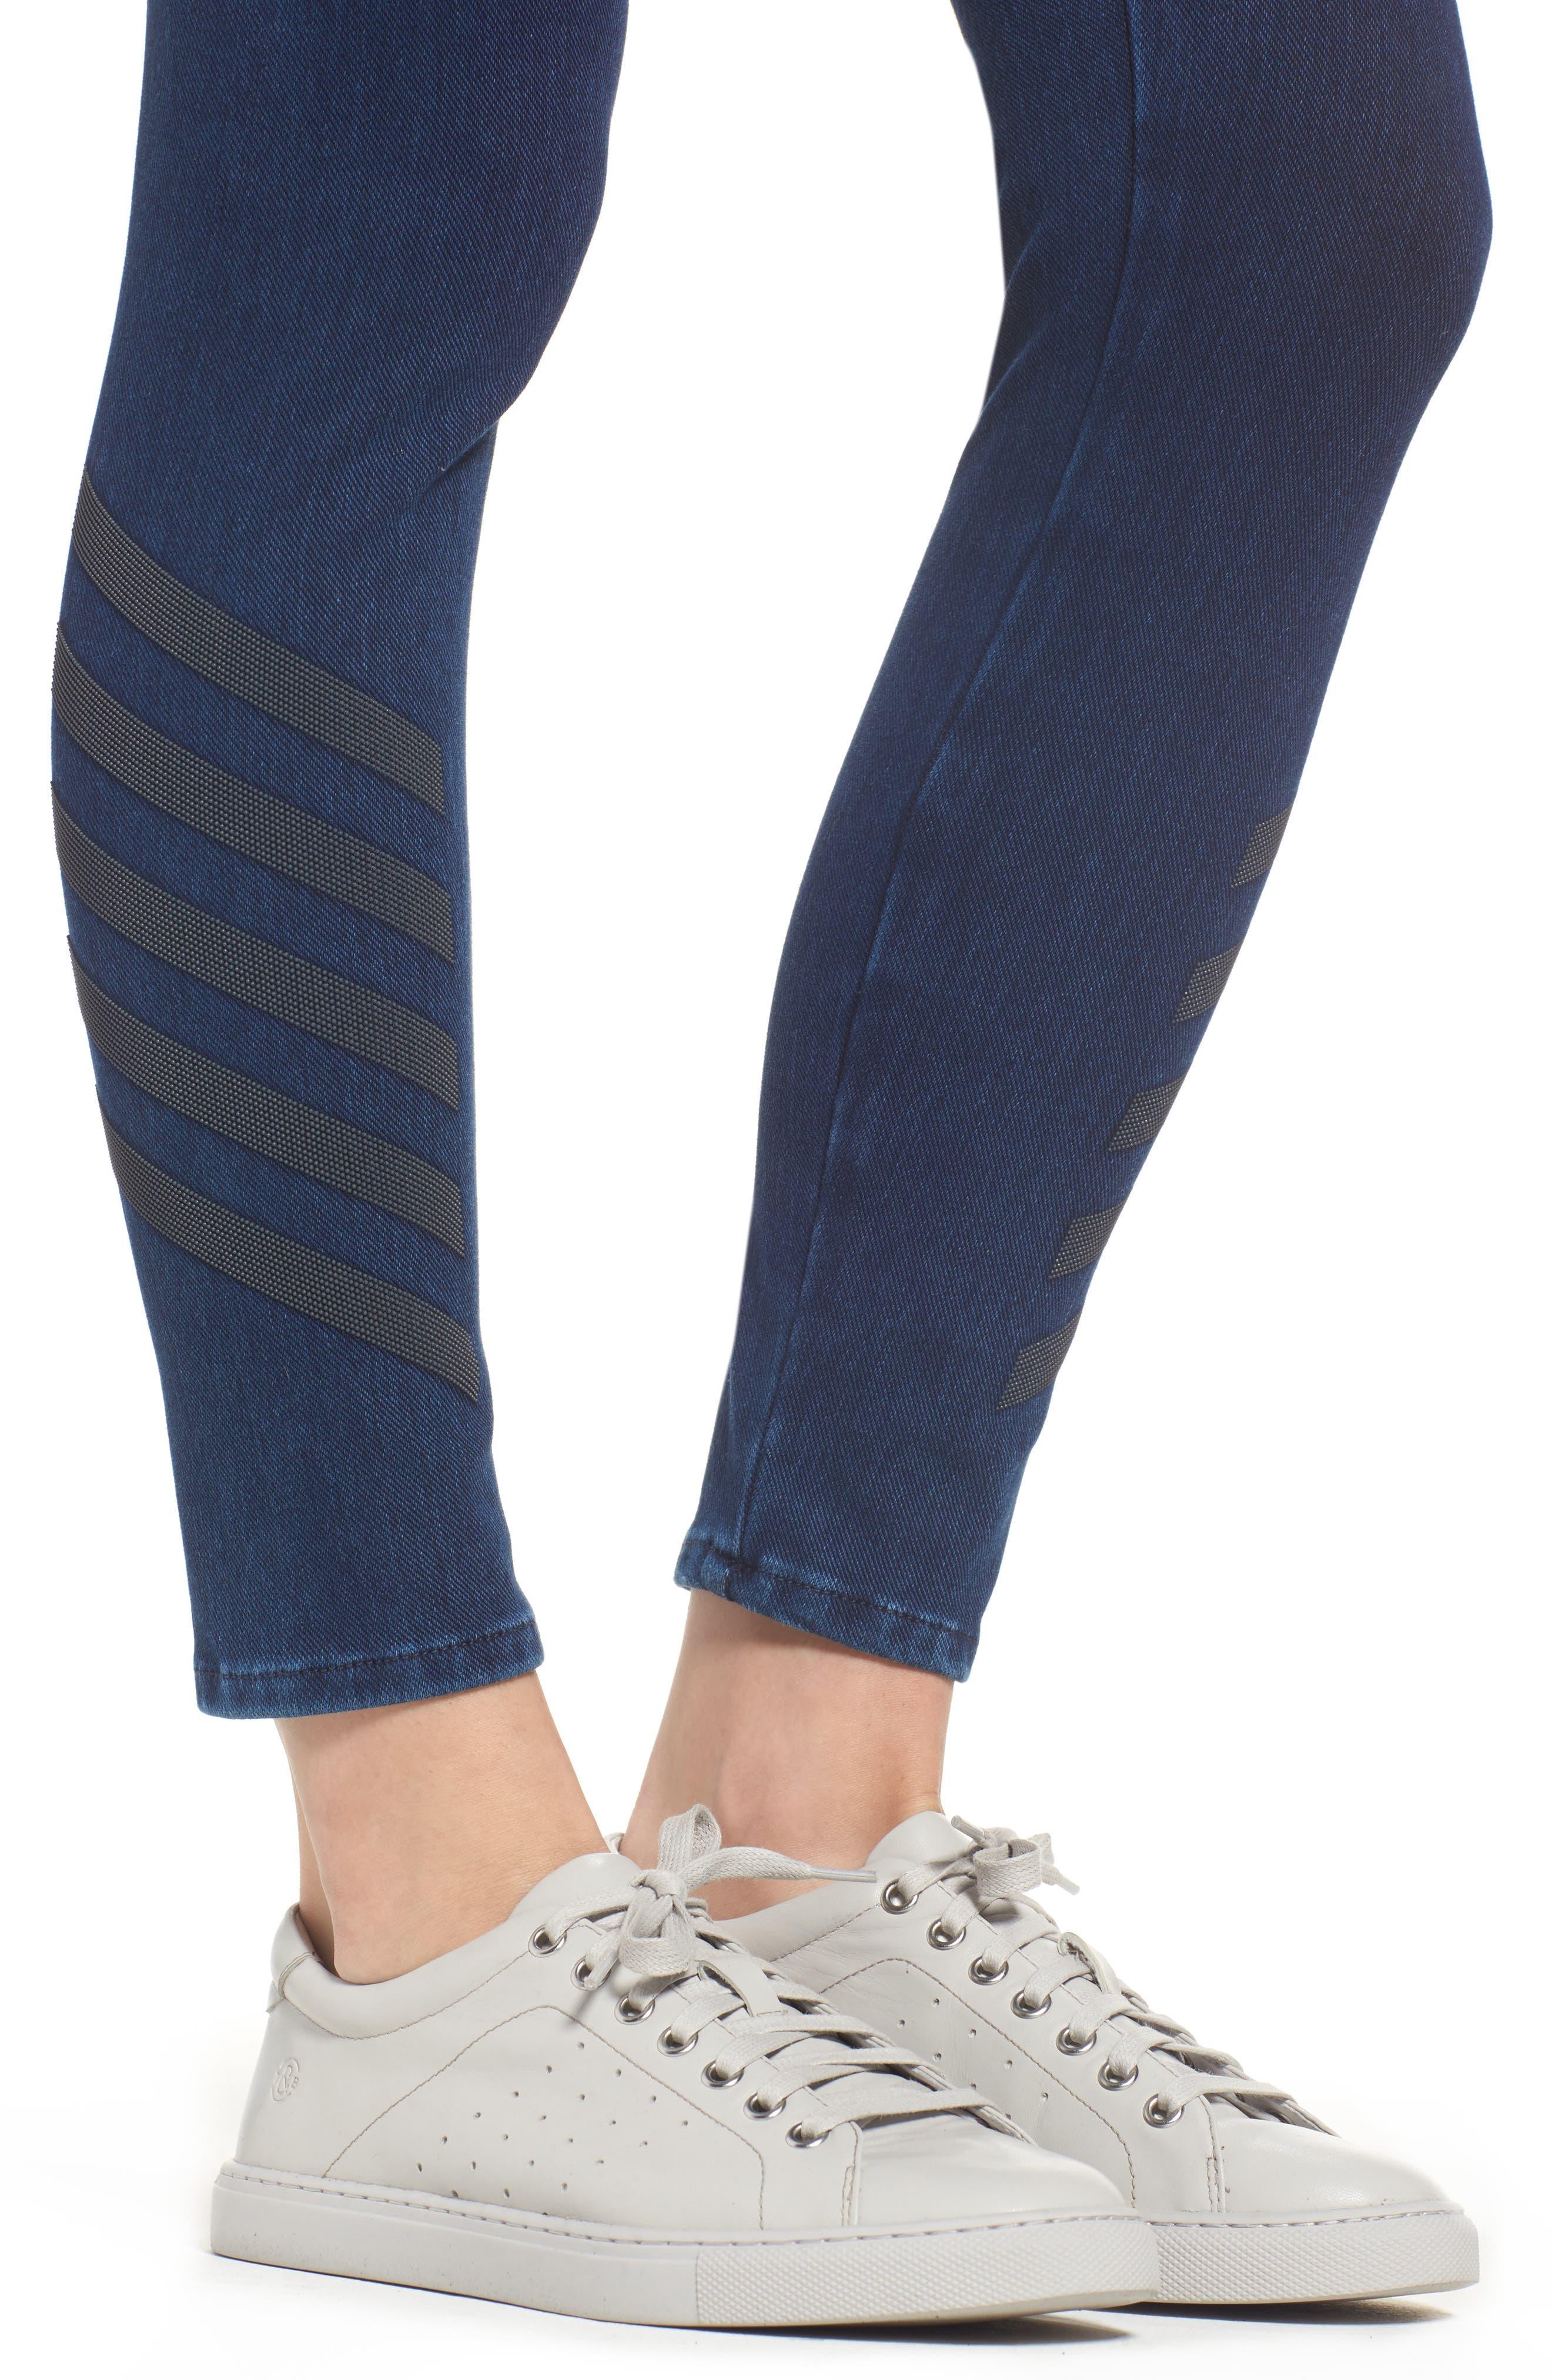 Joie Embellished High Waist Skinny Jeans,                             Alternate thumbnail 4, color,